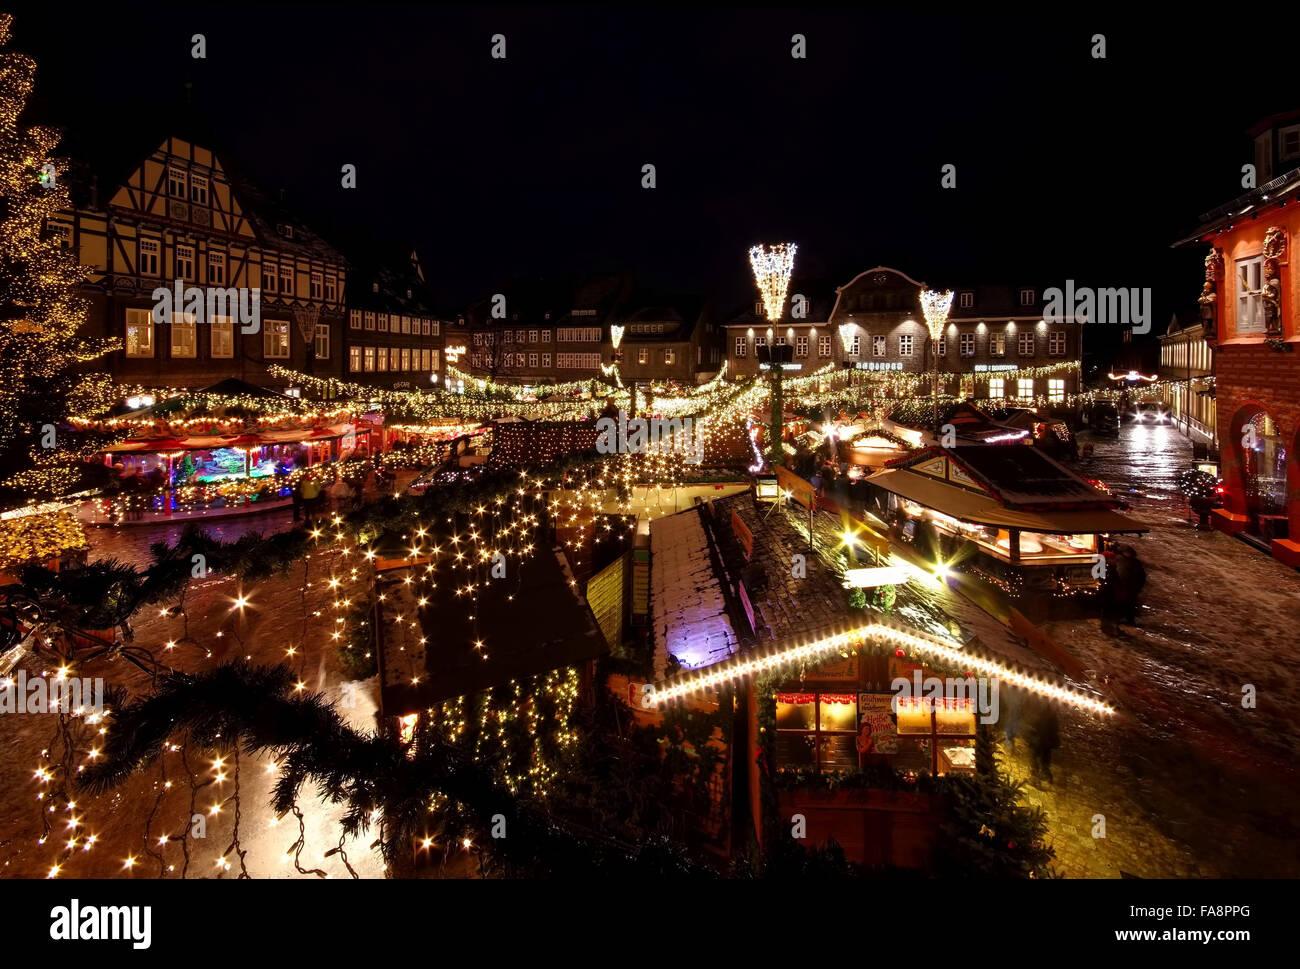 Goslar Weihnachtsmarkt.Goslar Weihnachtsmarkt Goslar Christmas Market 03 Stock